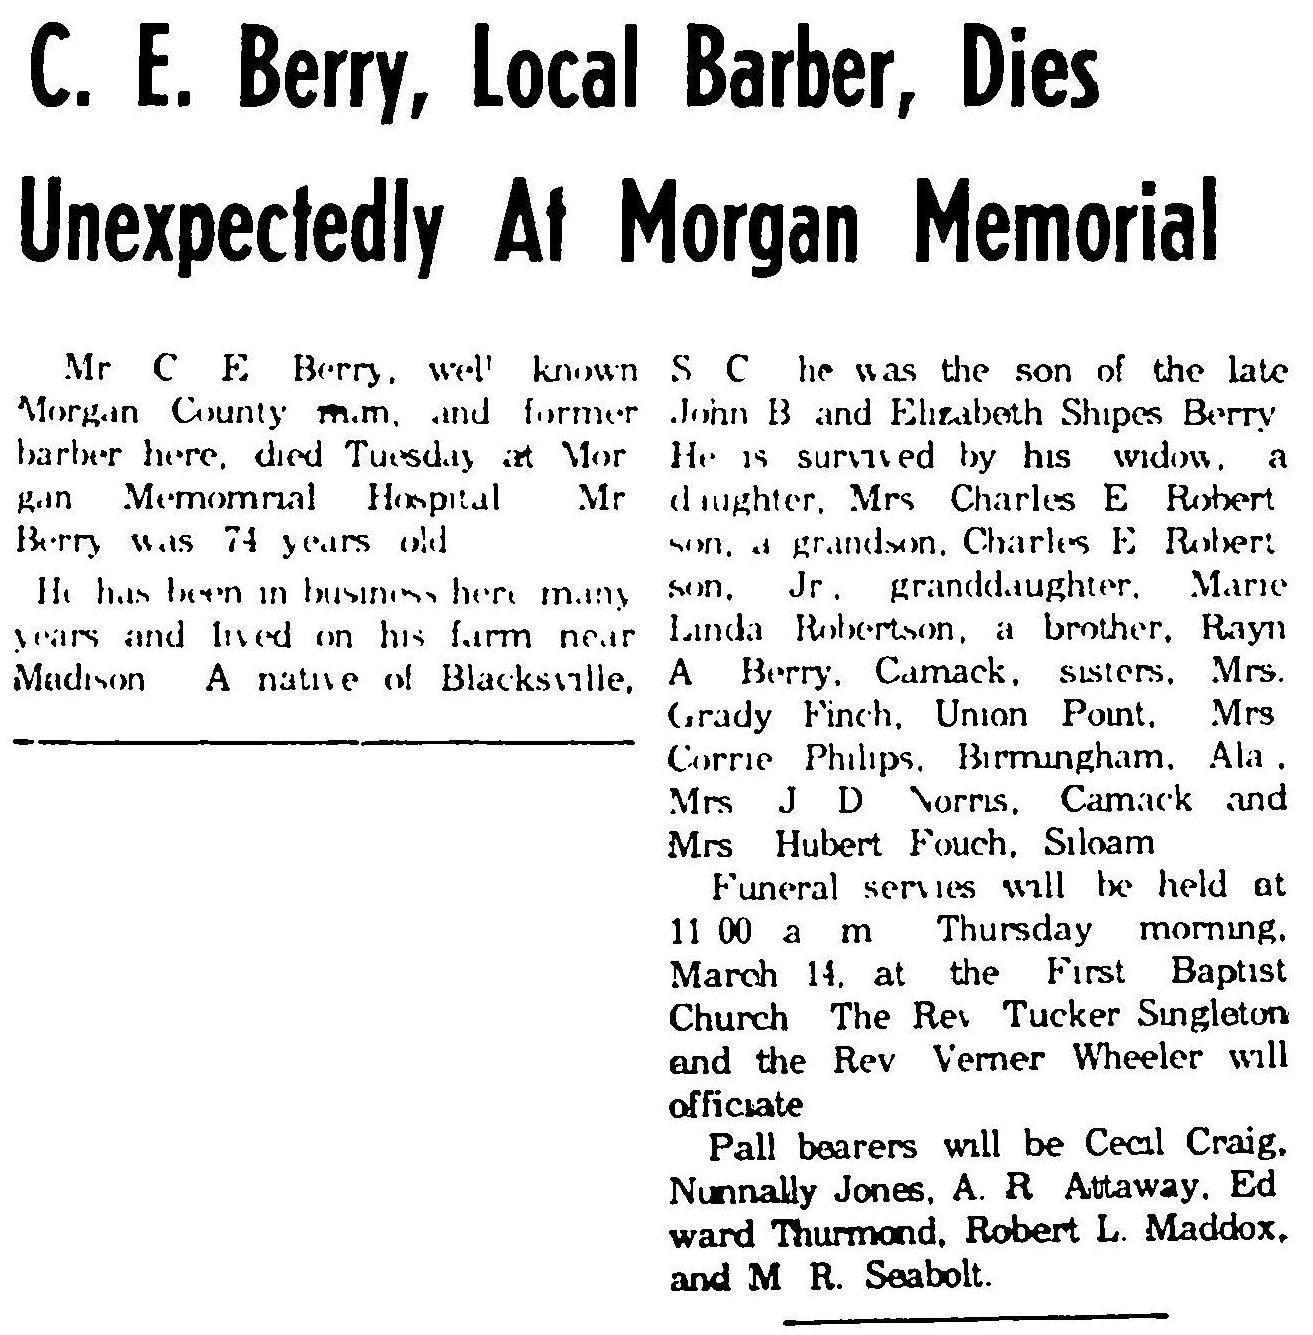 berry_clarenceeuguene_1963-obituary.jpeg